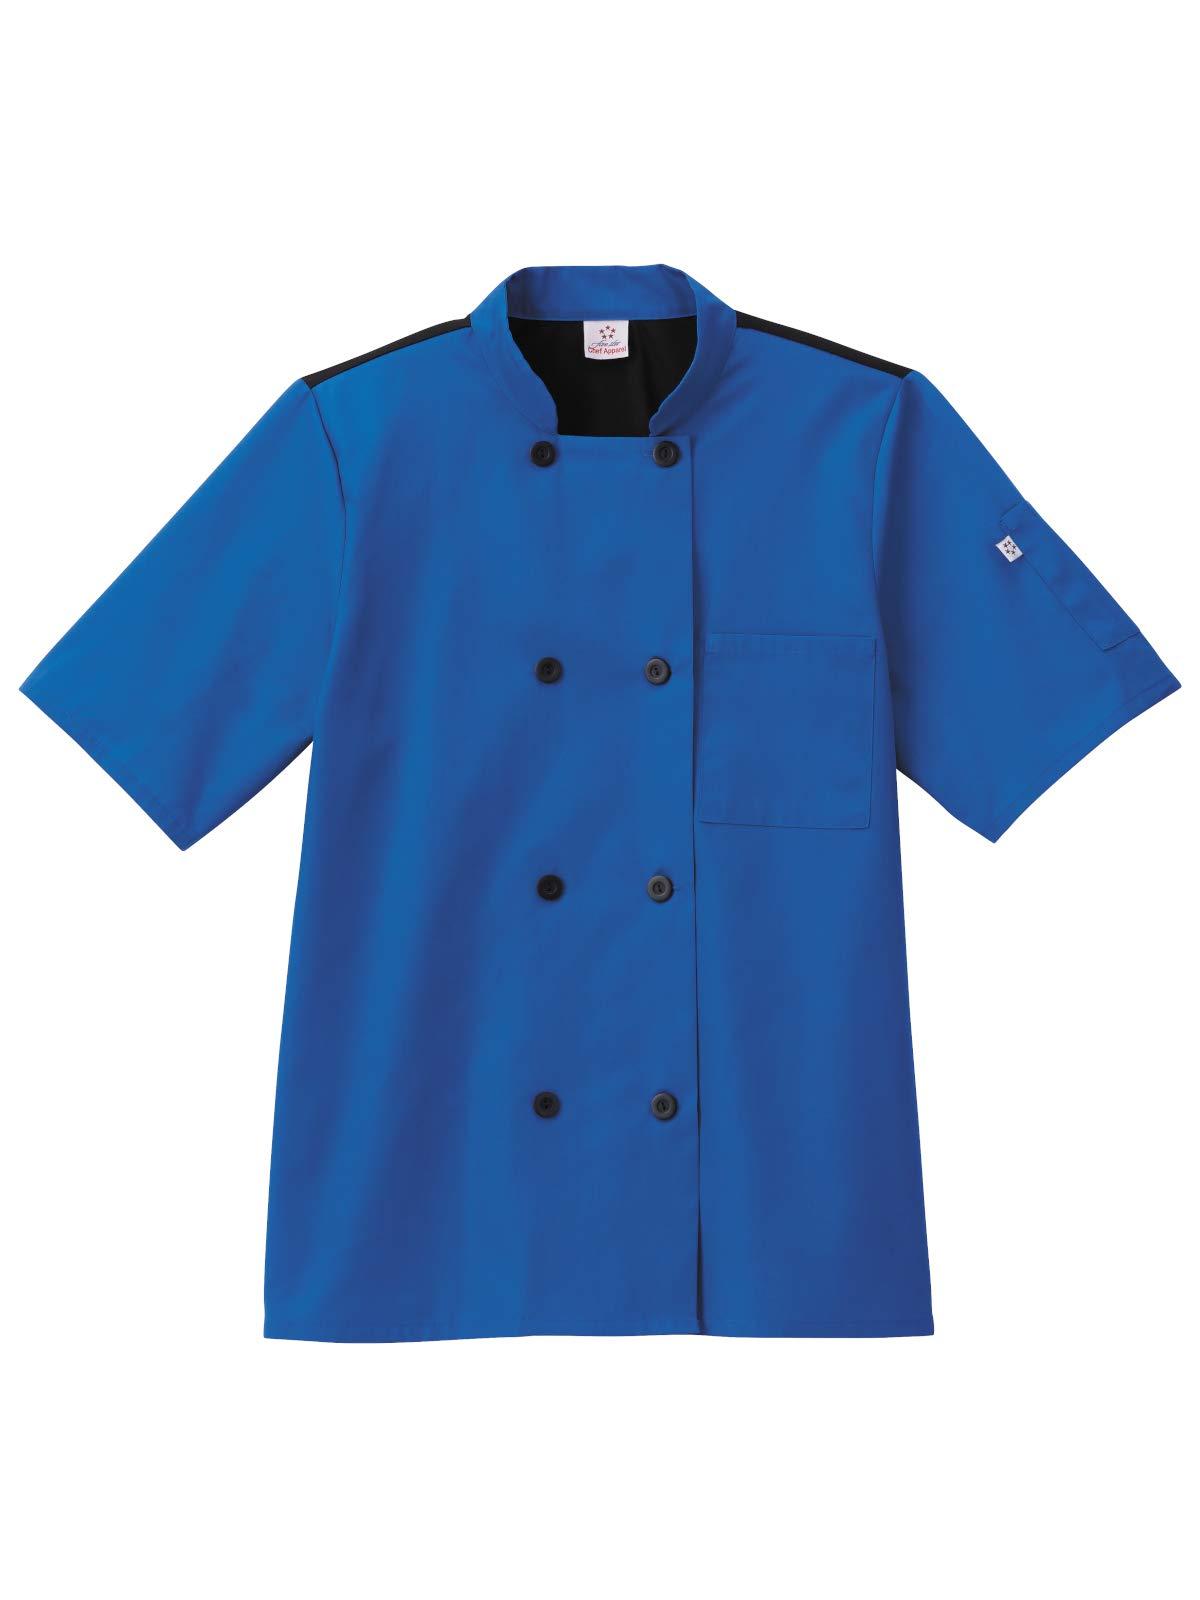 Five Star Chef Apparel Unisex Moisture Wicking Mesh Back Coat (Royal, Medium)